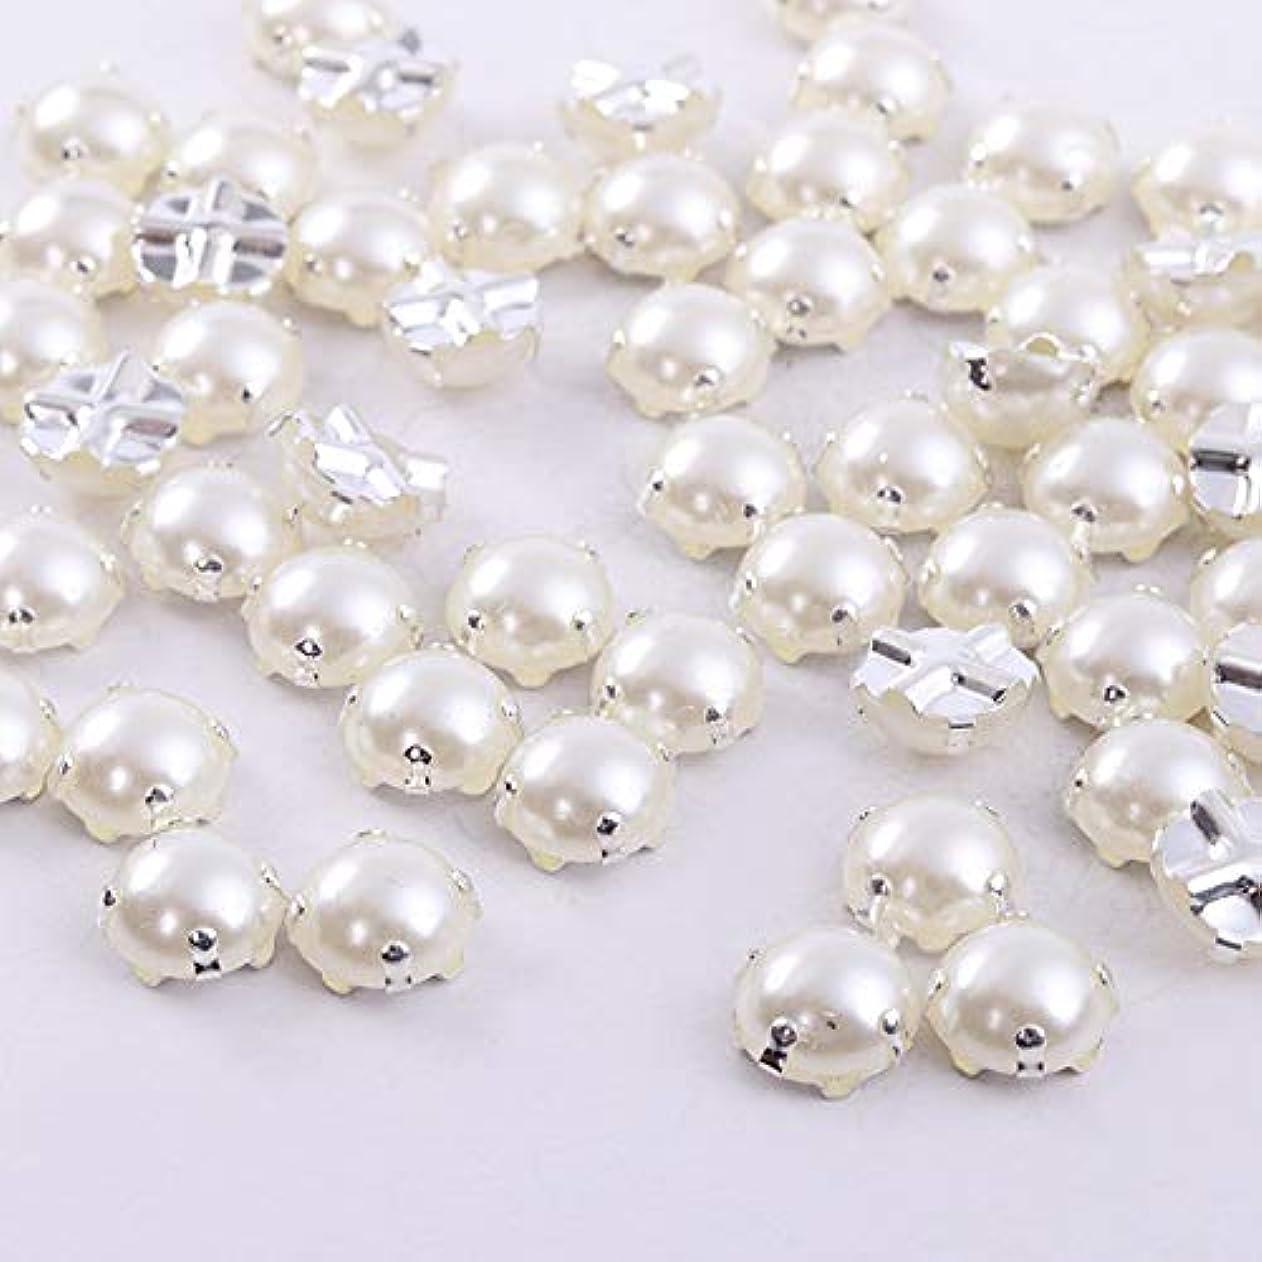 200PCS Sewing Pearl Beads Rhinestones Sew On Pearl Rhinestones with Silver Claw Flatback Half Round Pearl for Craft Garment (Silver Claw, 5mm) pvdjbnqjzwz42868